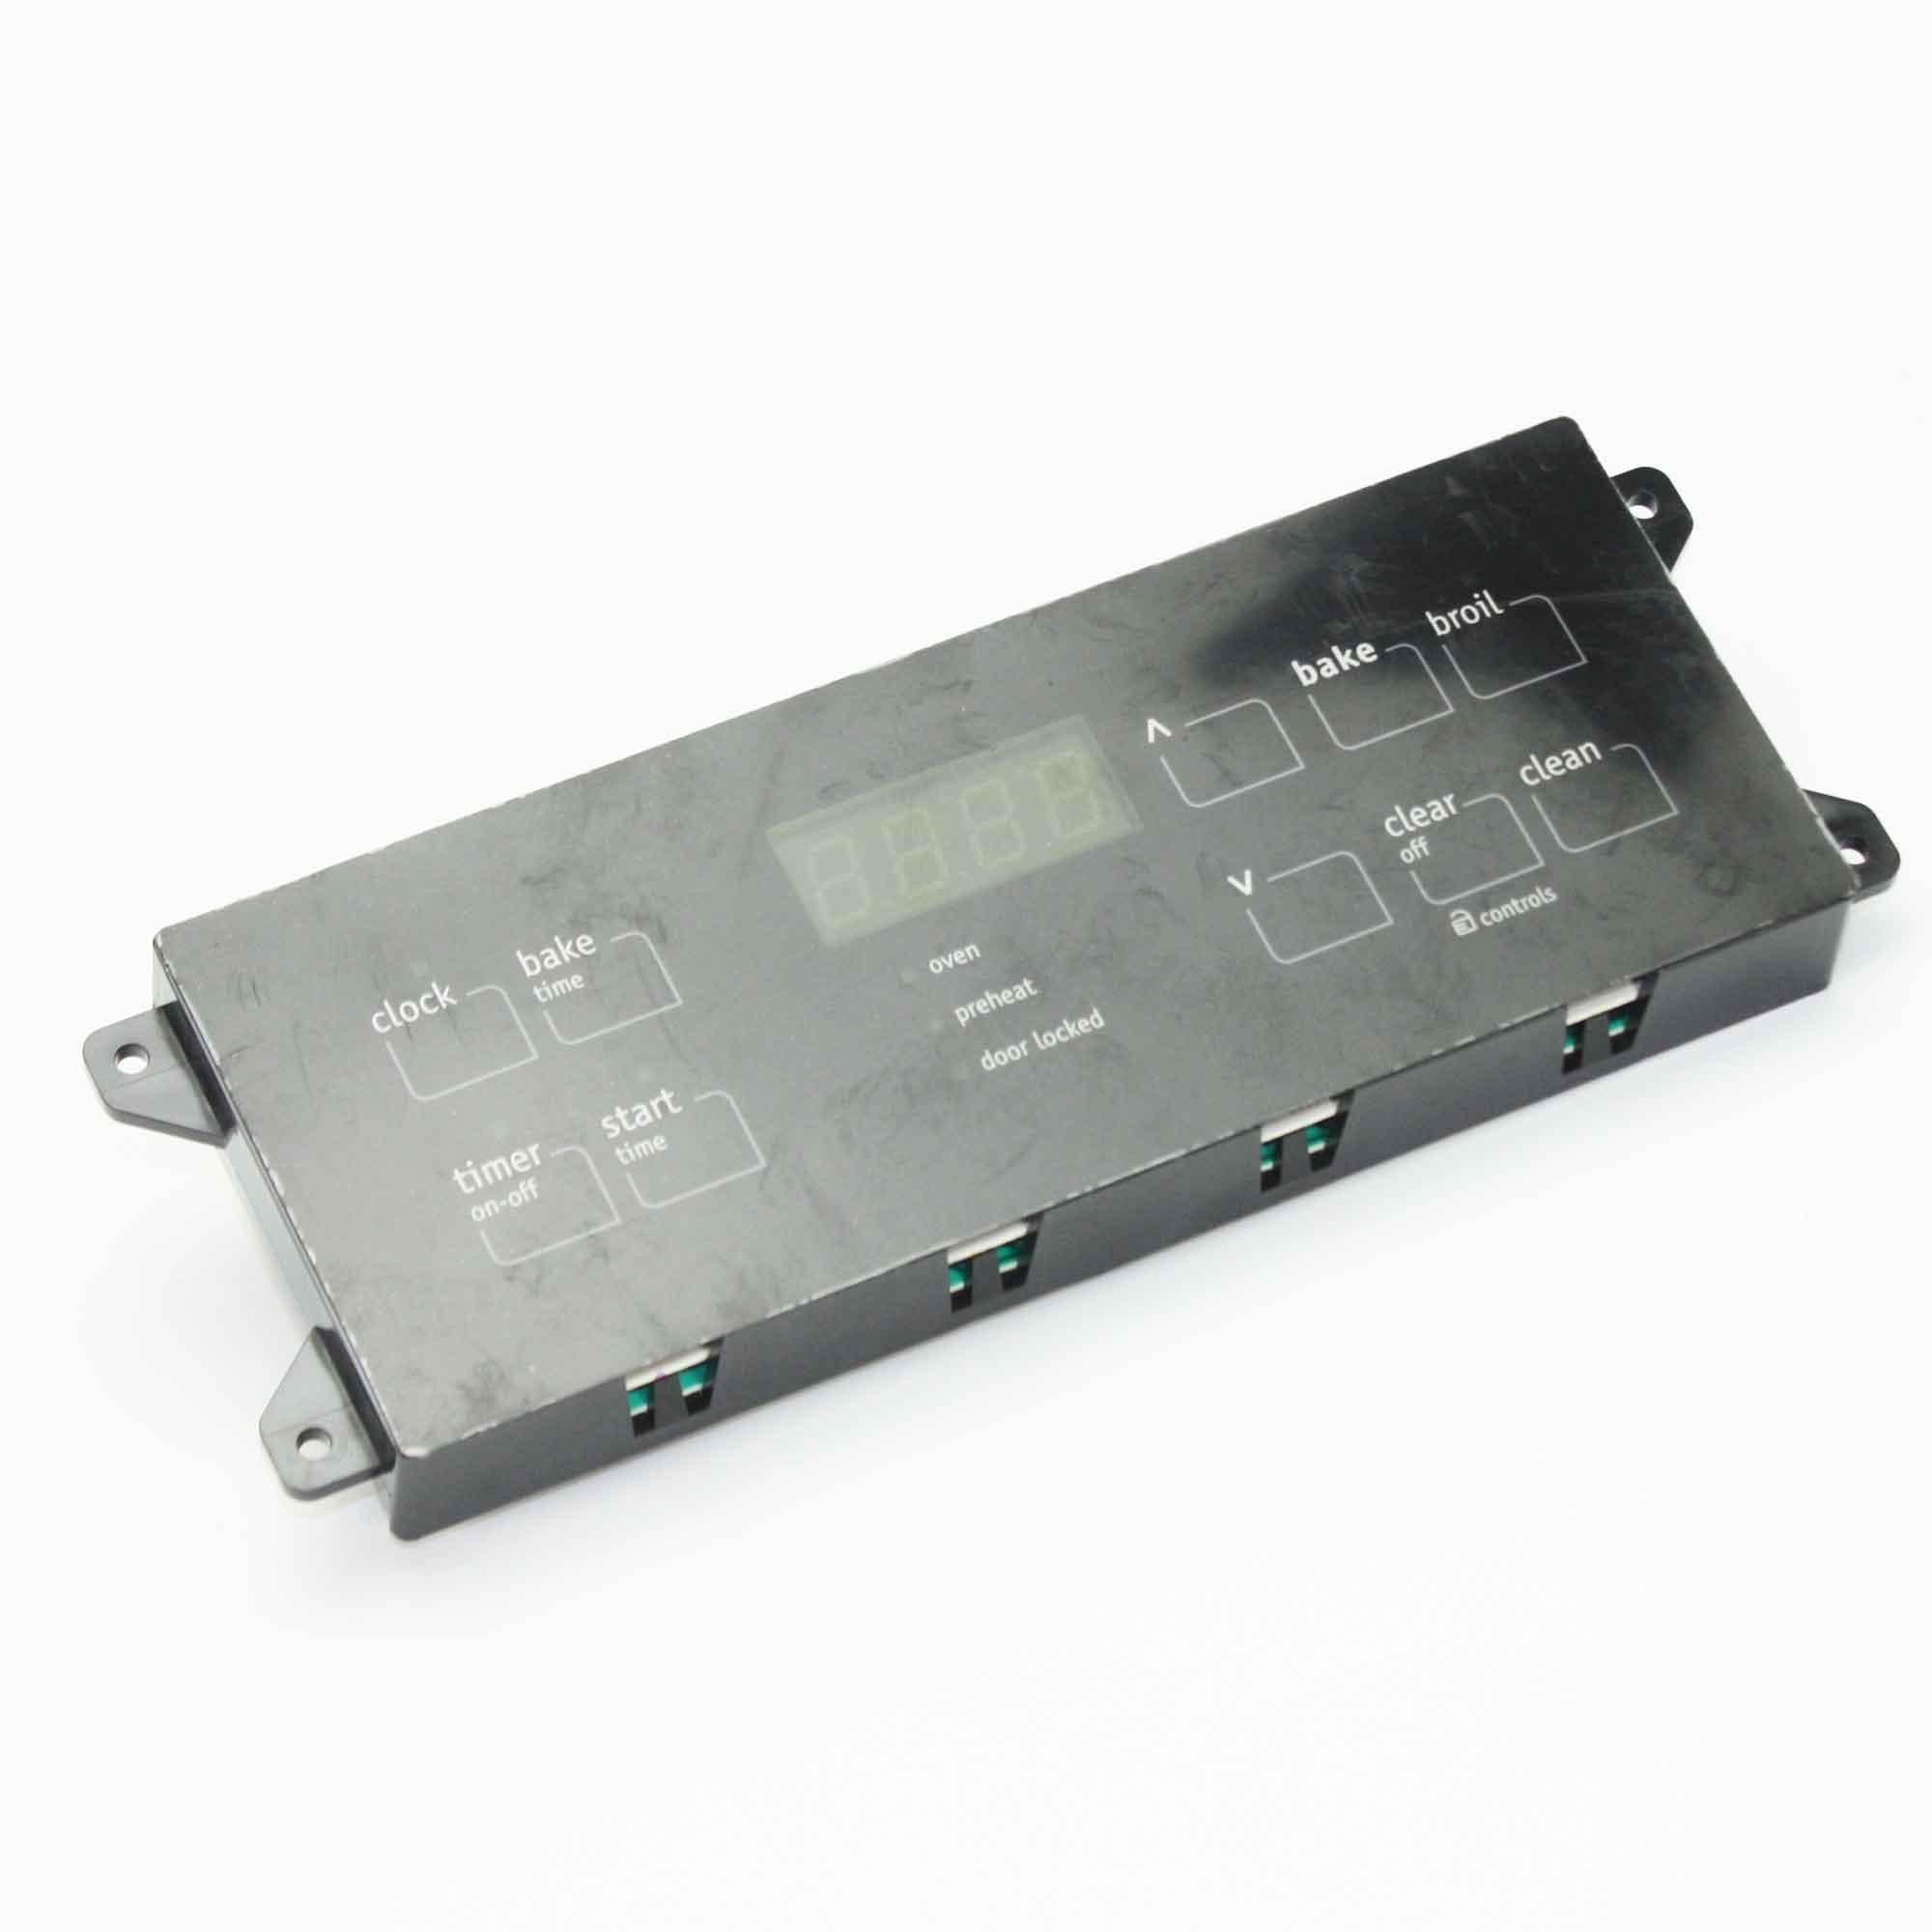 318185731 For Frigidaire Range Oven Control Board